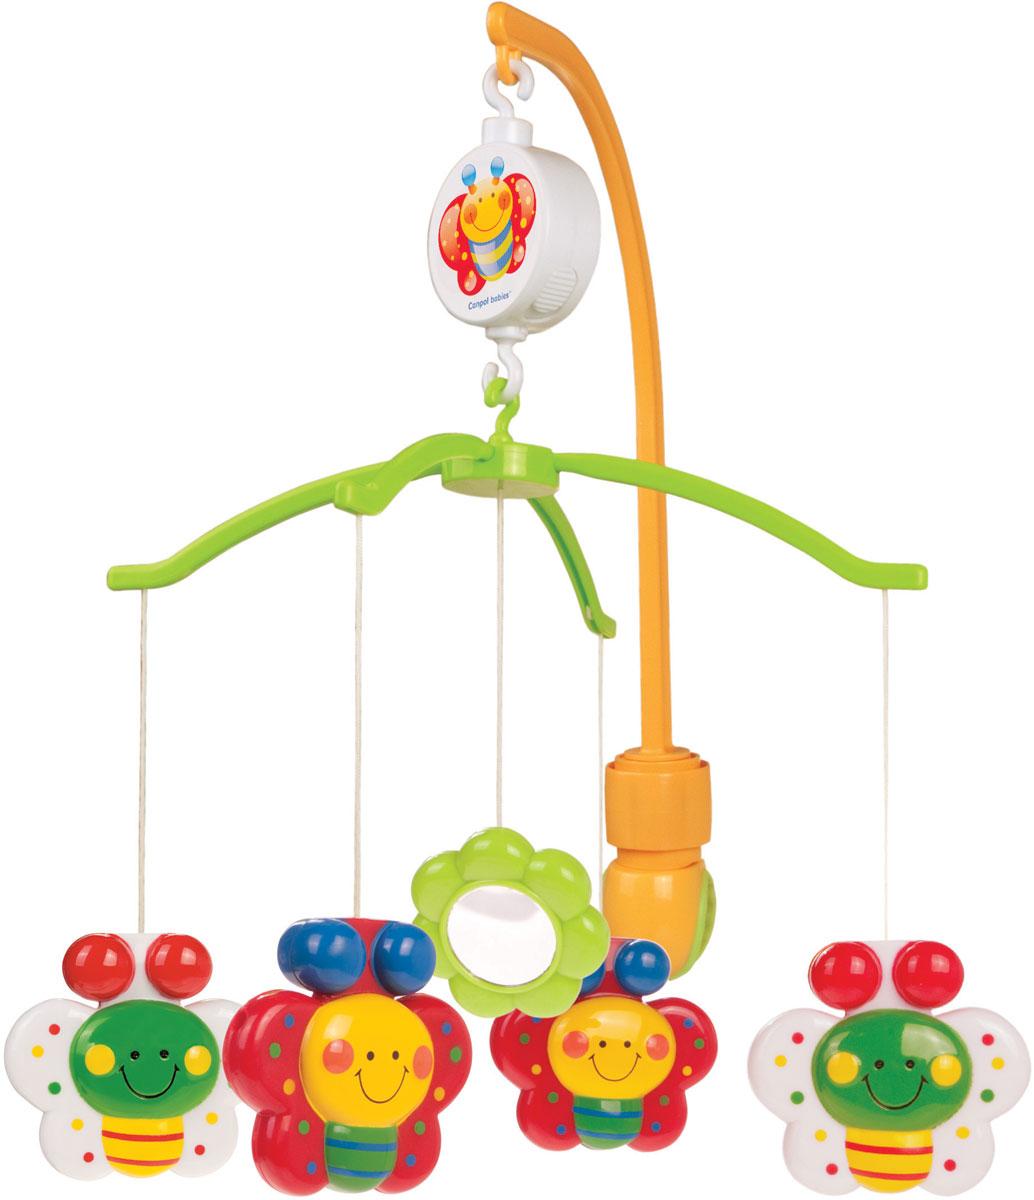 Canpol Babies Мобиль музыкальный Бабочки Happy Garden canpol babies мобиль canpol babies музыкальный бабочки